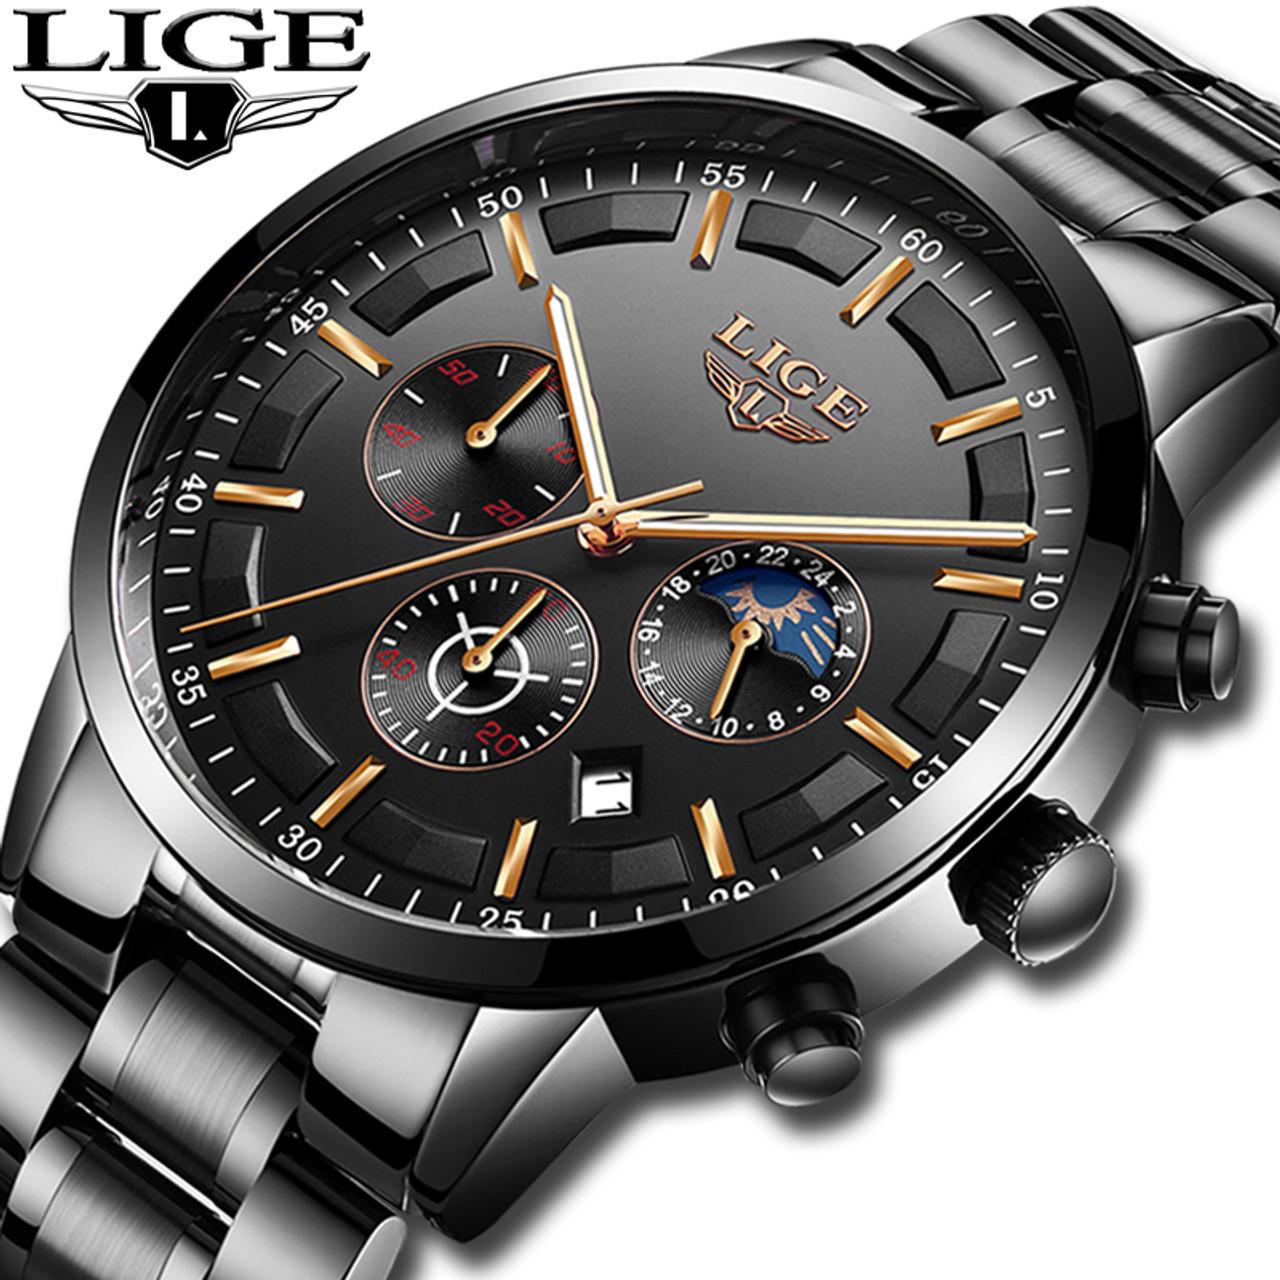 eb417f6dea4 Relojes 2018 Watch Men LIGE Fashion Sport Quartz Clock Mens Watches Top  Brand Luxury Business Waterproof Watch Relogio Masculino - OnshopDeals.Com